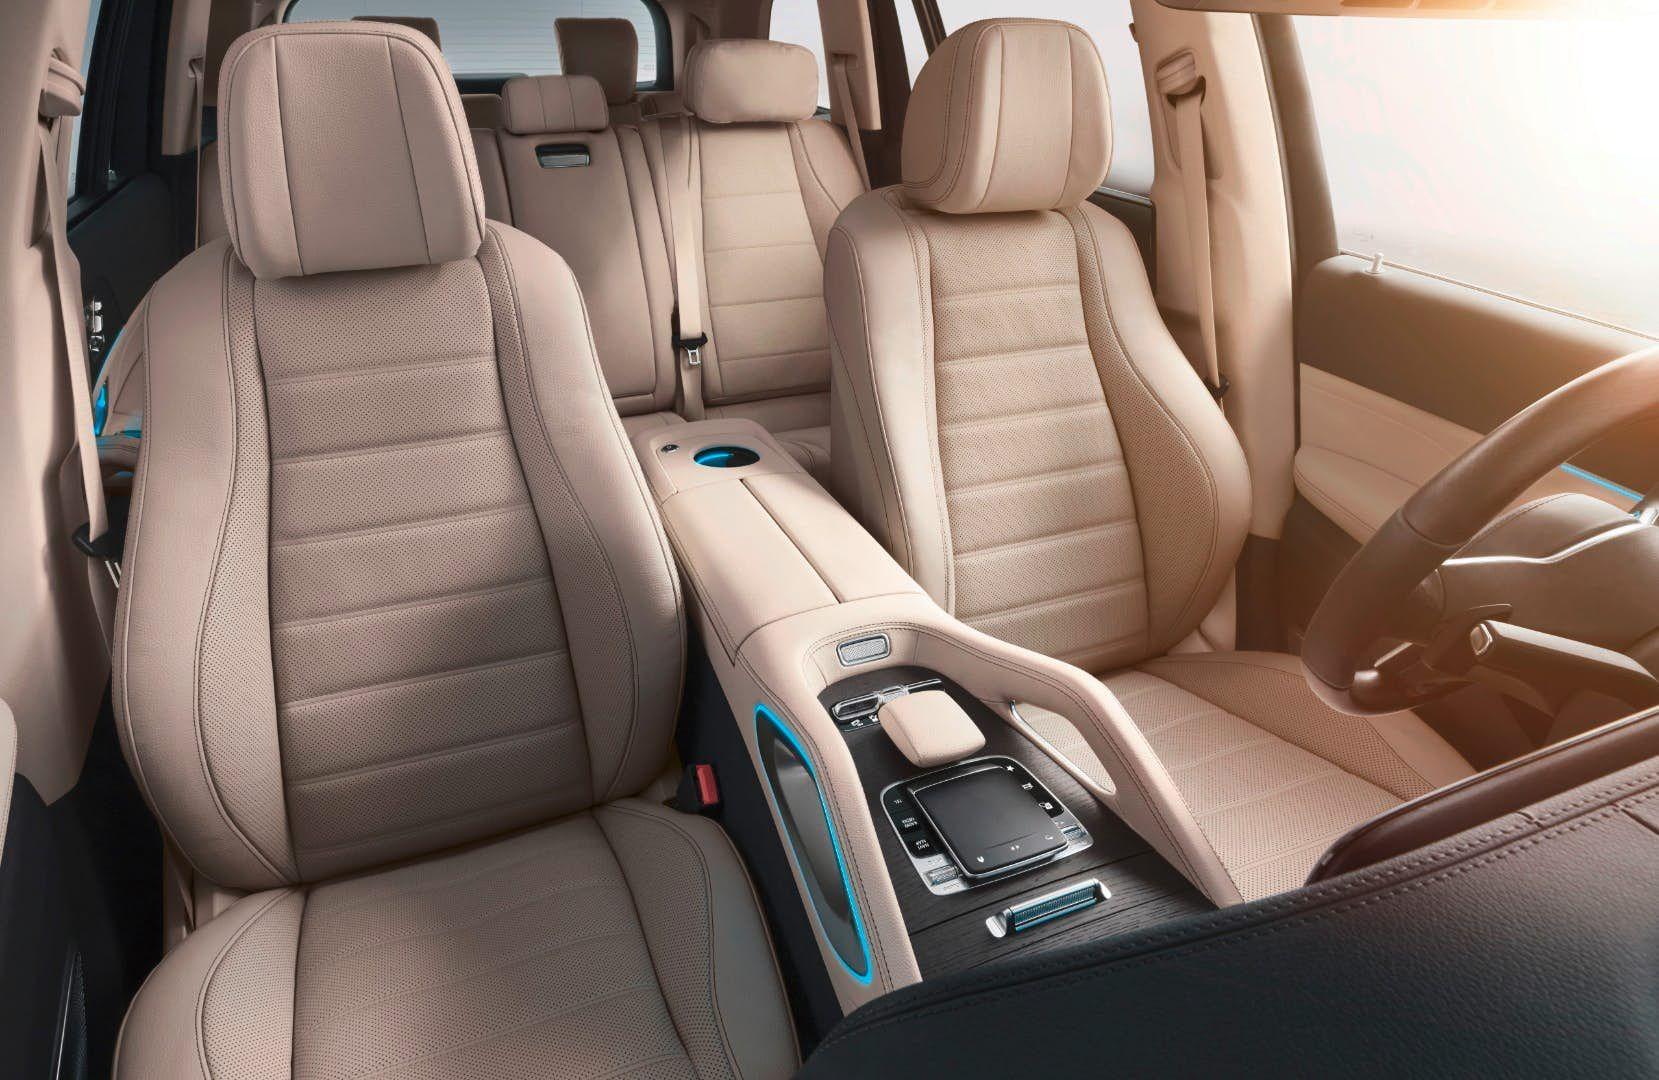 2020 Mercedes Benz X166 Gls Class Gls Gls63 Amg Gls450 Gls580